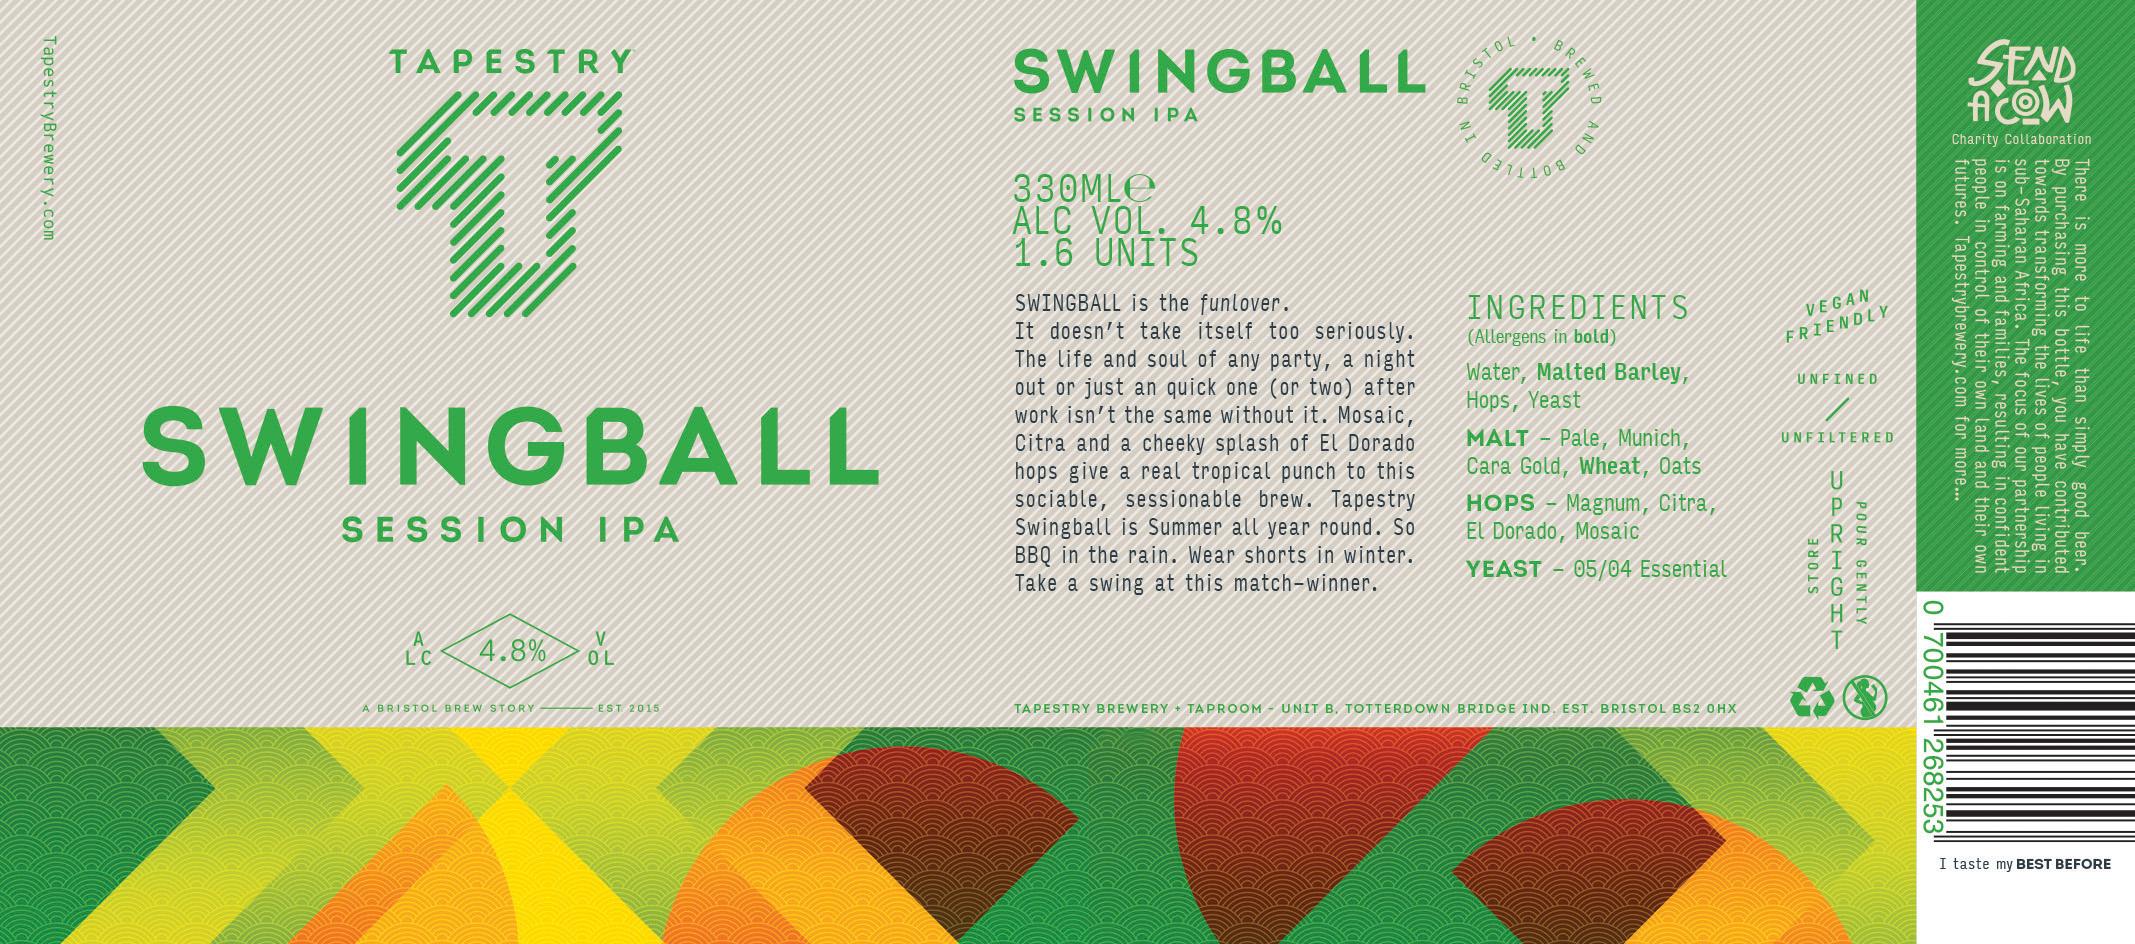 TAP_SWINGBALL_LABEL.jpg